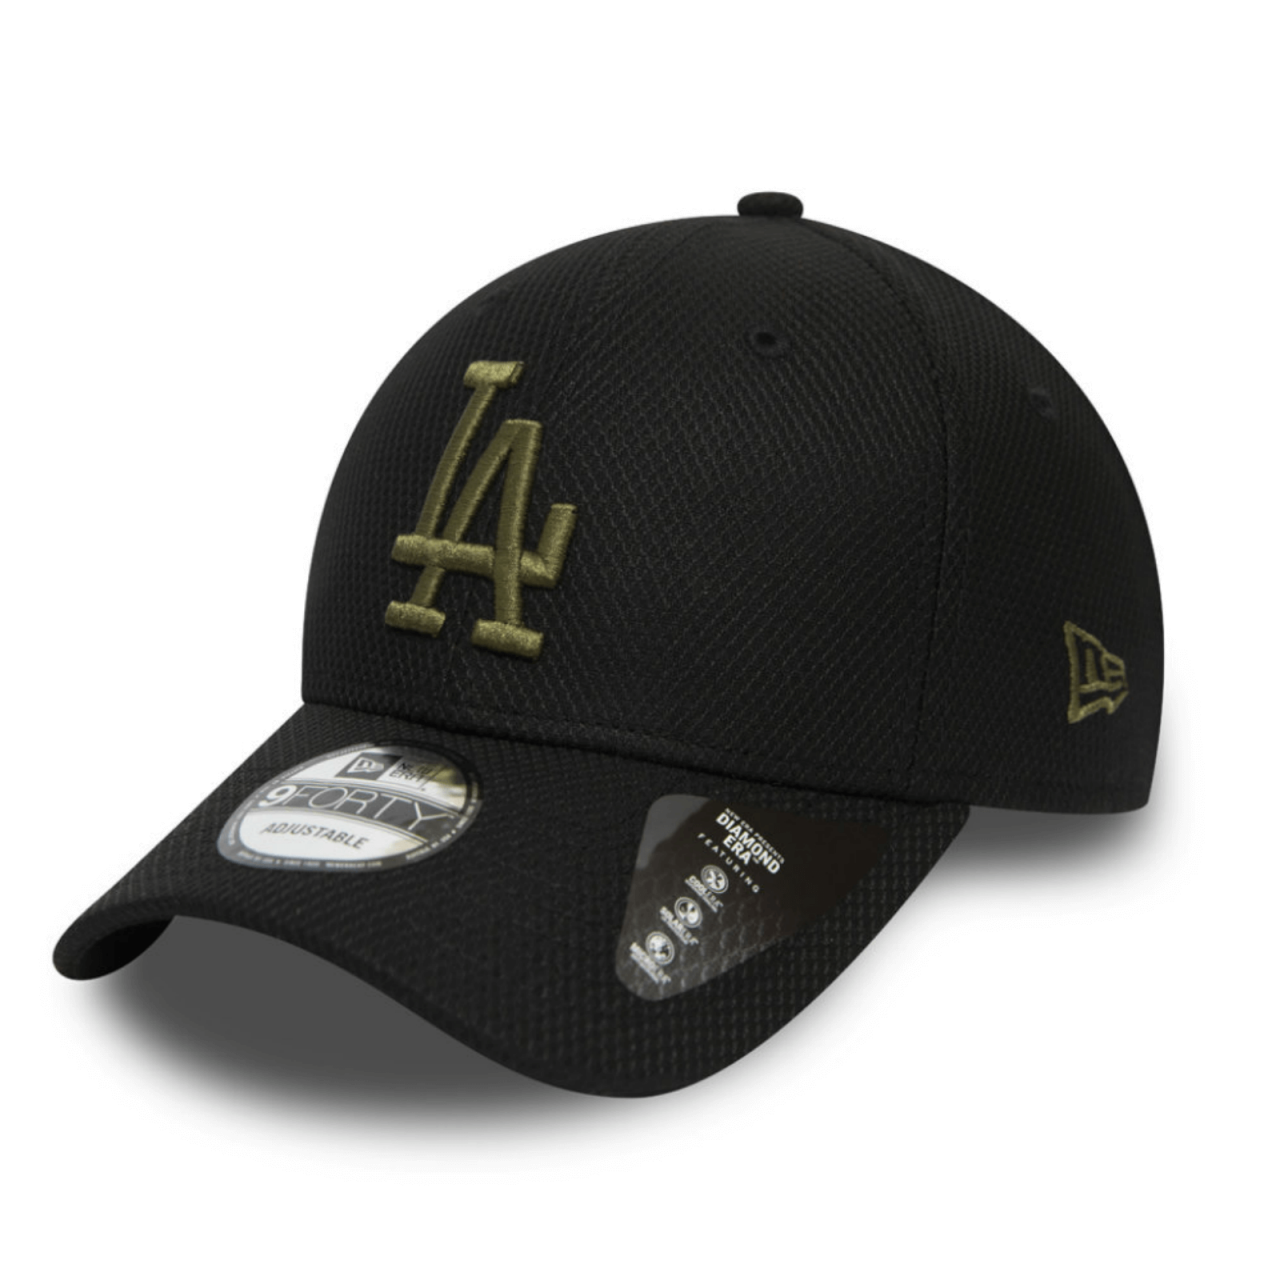 9FORTY DIAMOND ERA LOS ANGELES DODGERS BLACK CAP